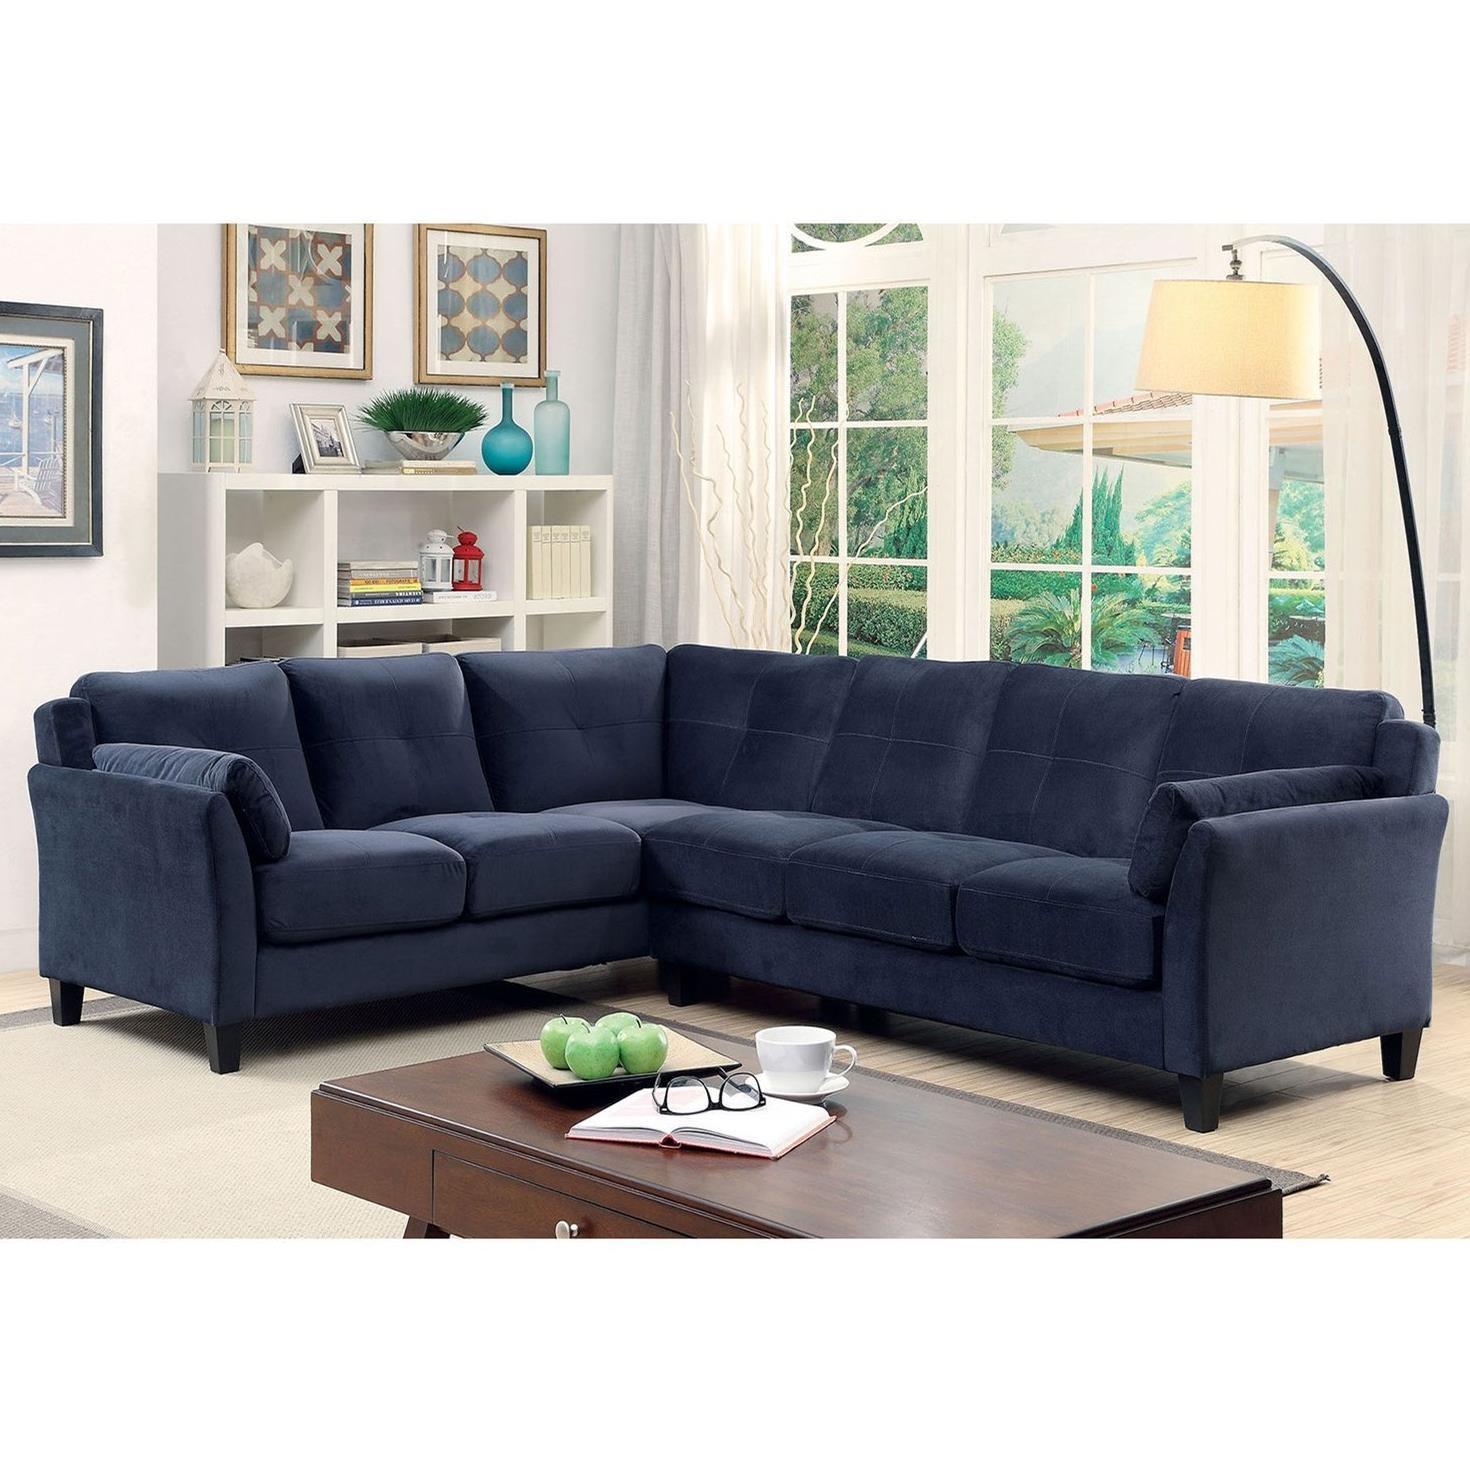 Furniture of America Peever II Modern Sectional Sofa with Flared ...